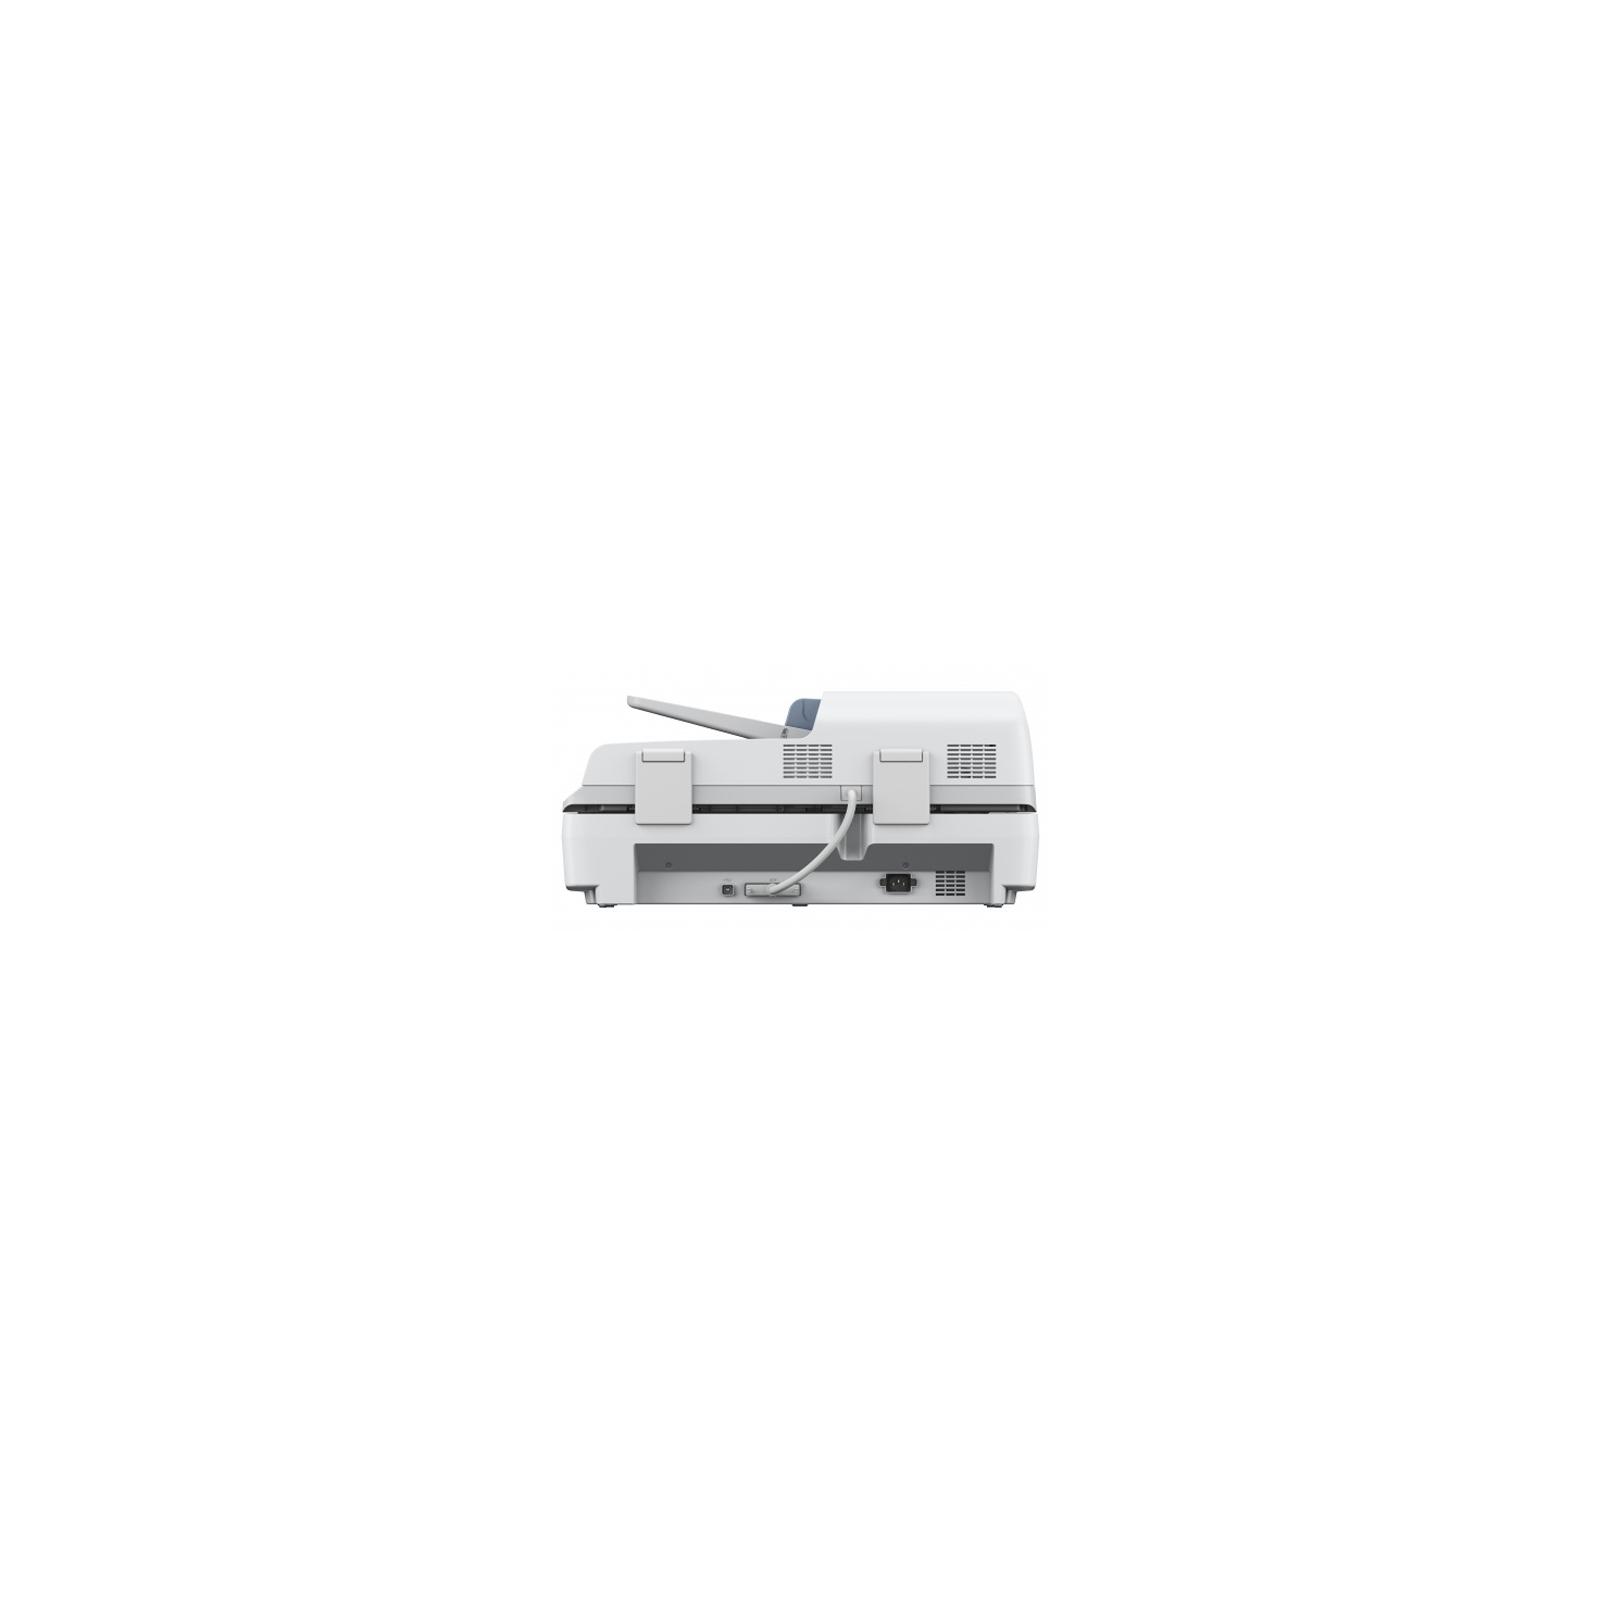 Сканер EPSON WorkForce DS-60000N (B11B204231BT) изображение 3